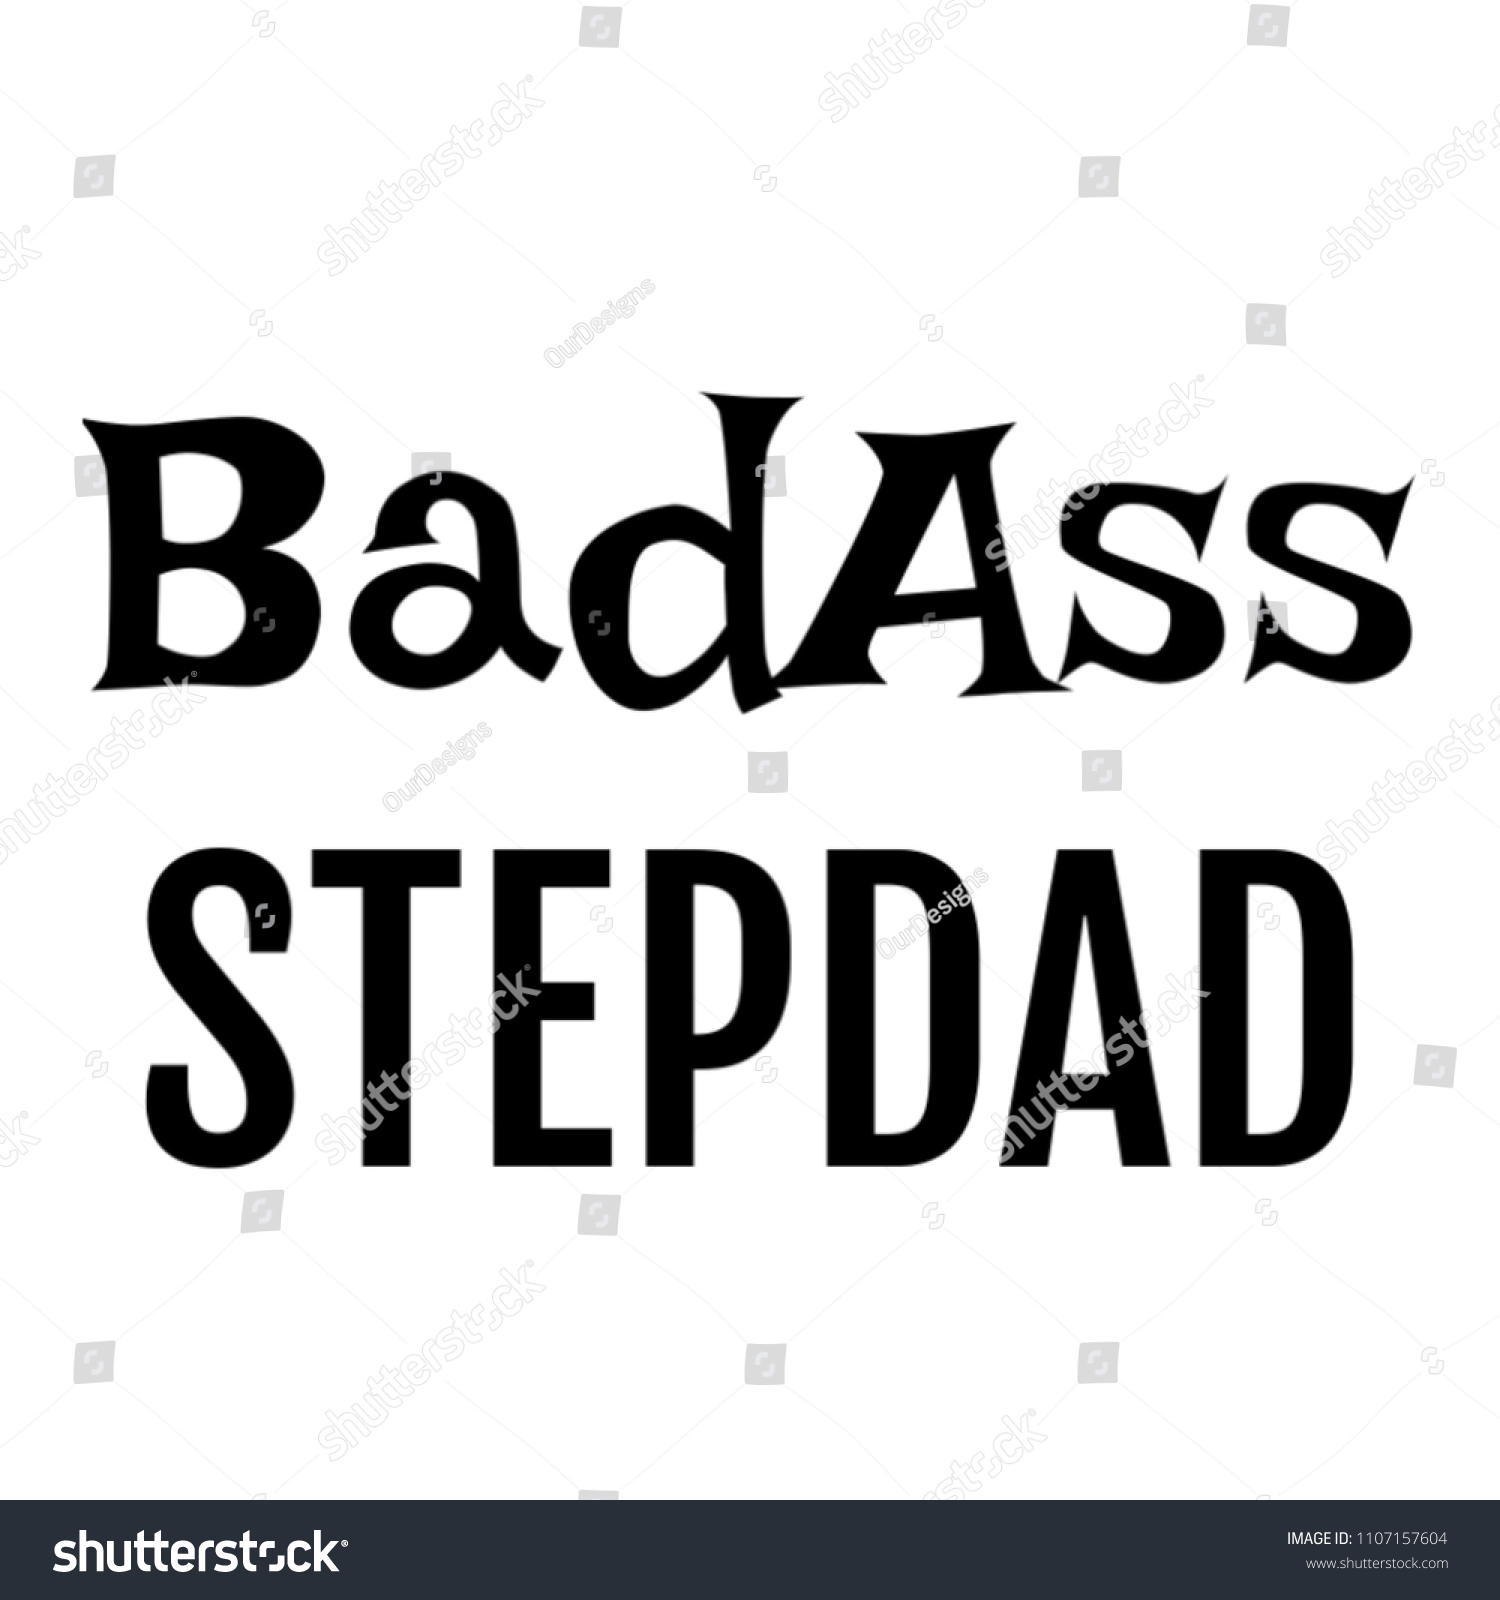 Badass Stepdad Gifts Him On Birthday Stock Illustration 1107157604 ...